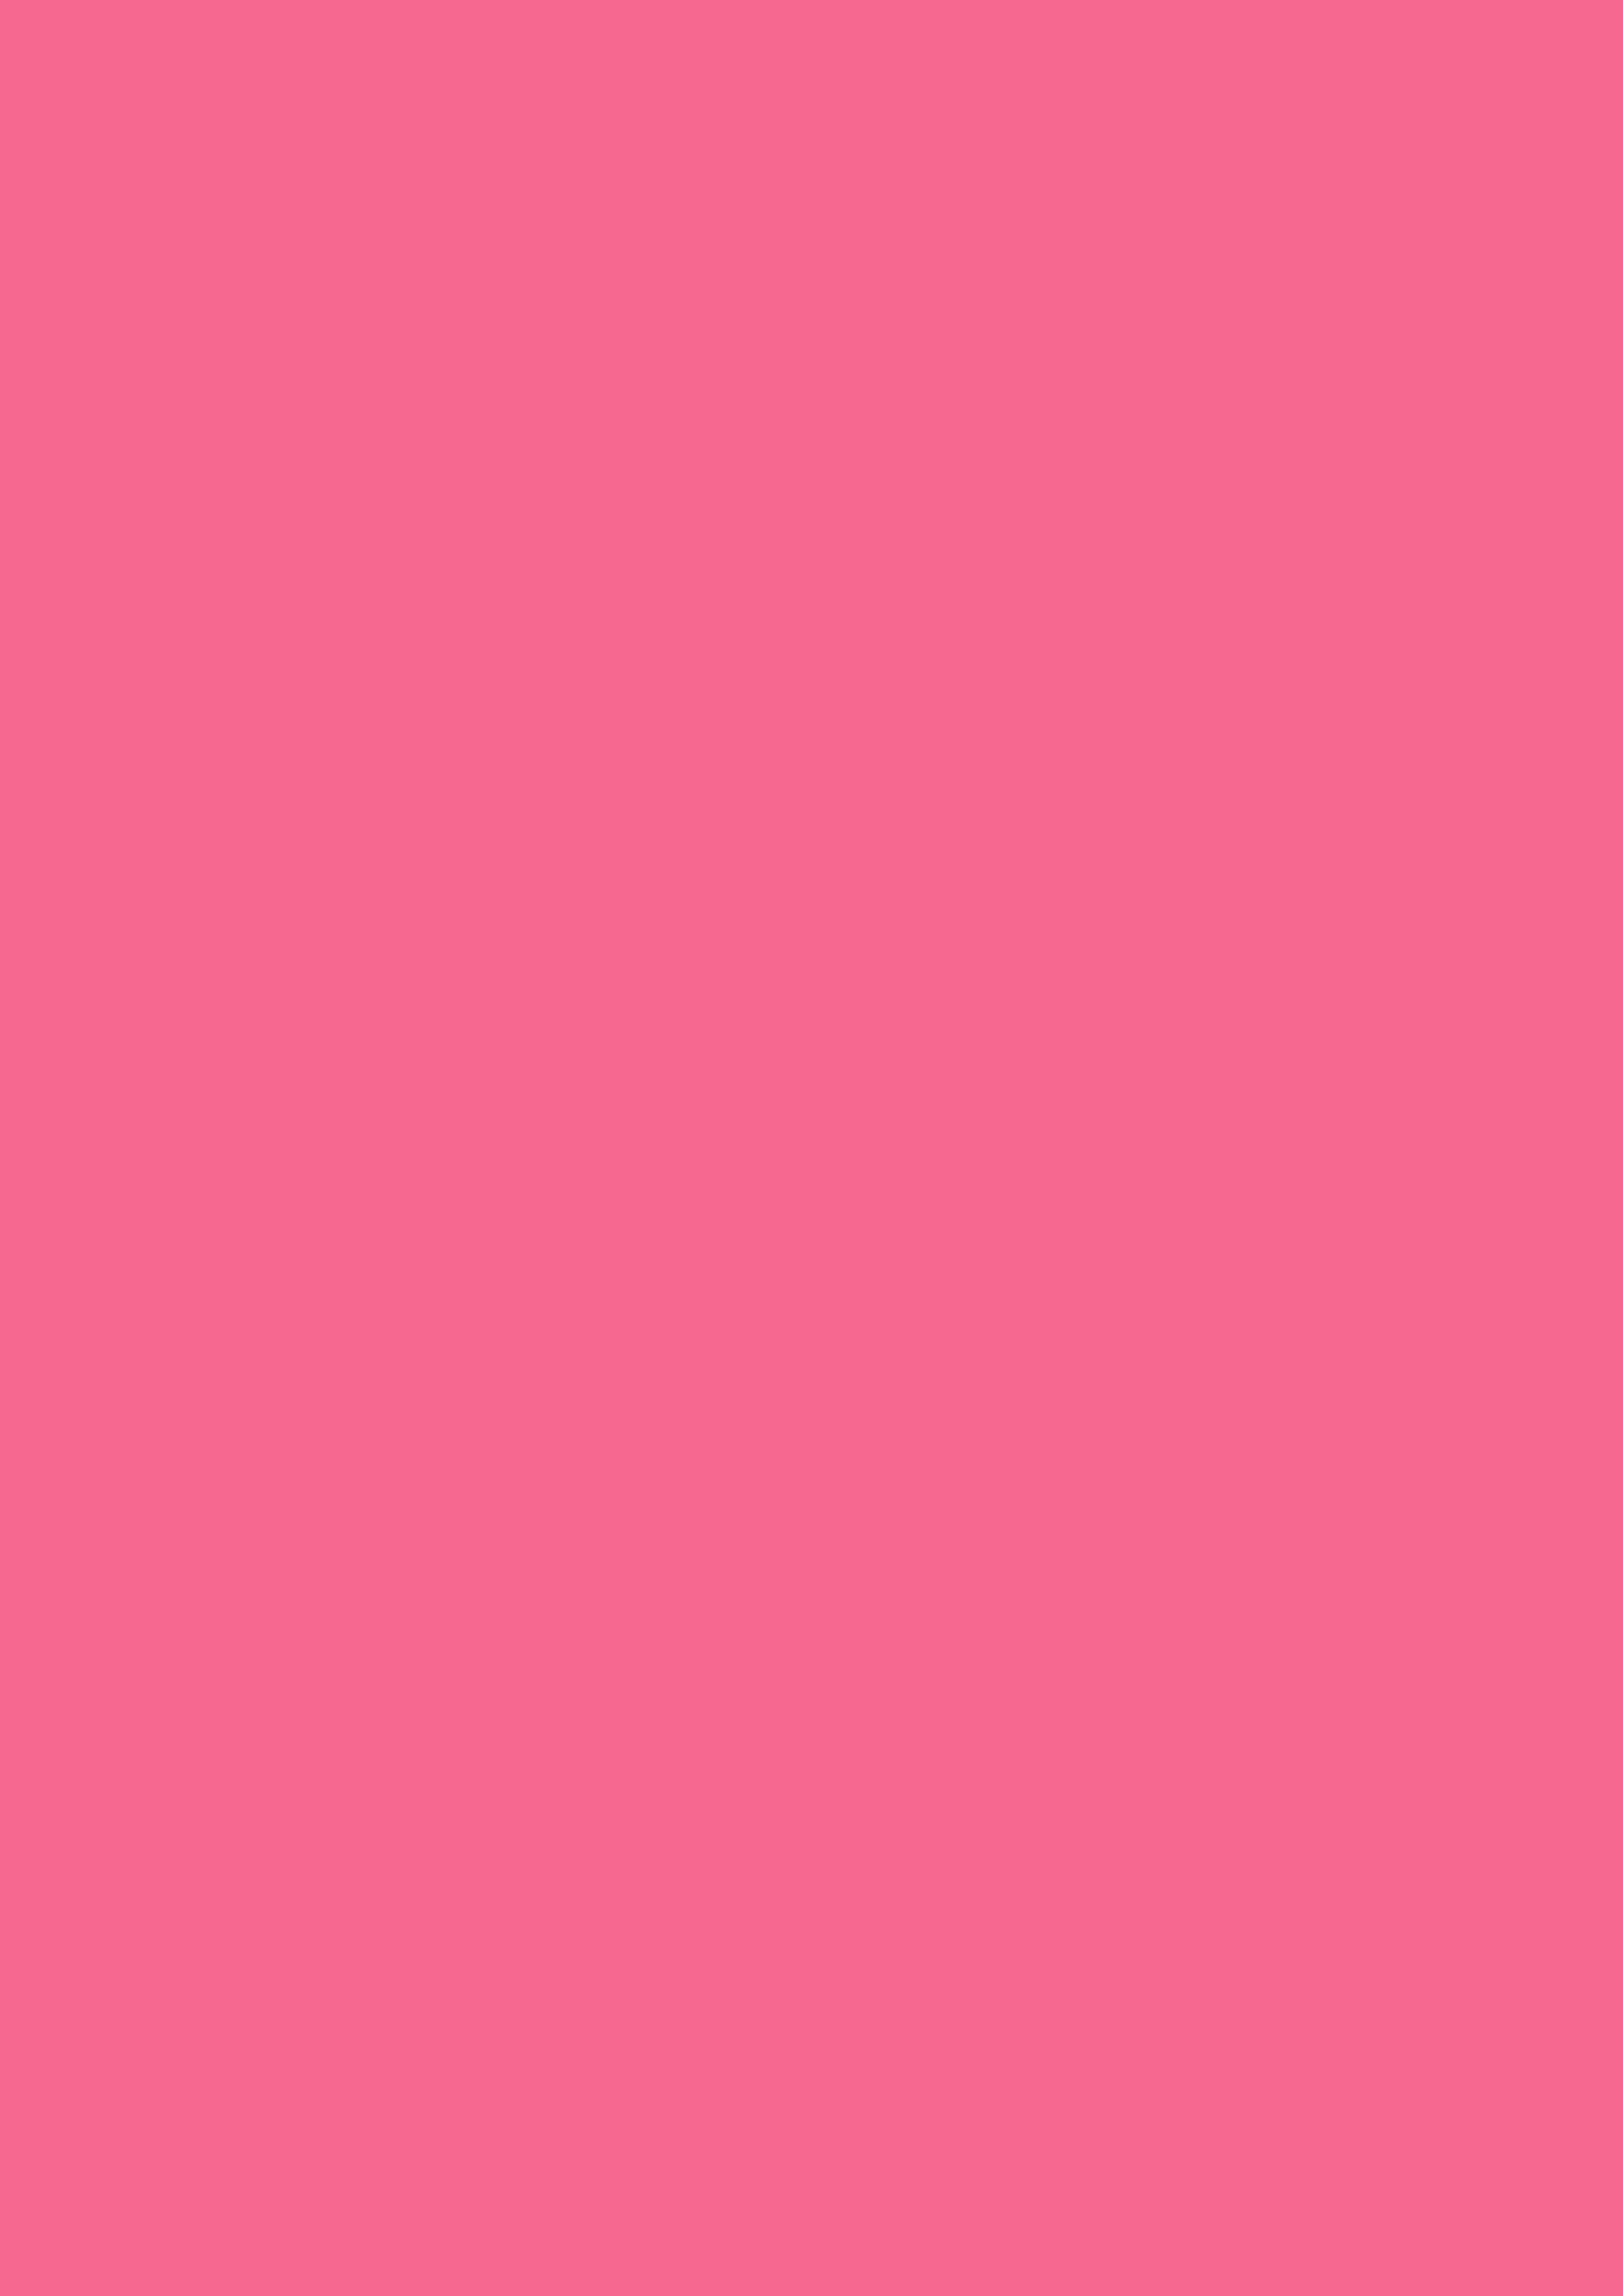 2480x3508 Light Crimson Solid Color Background